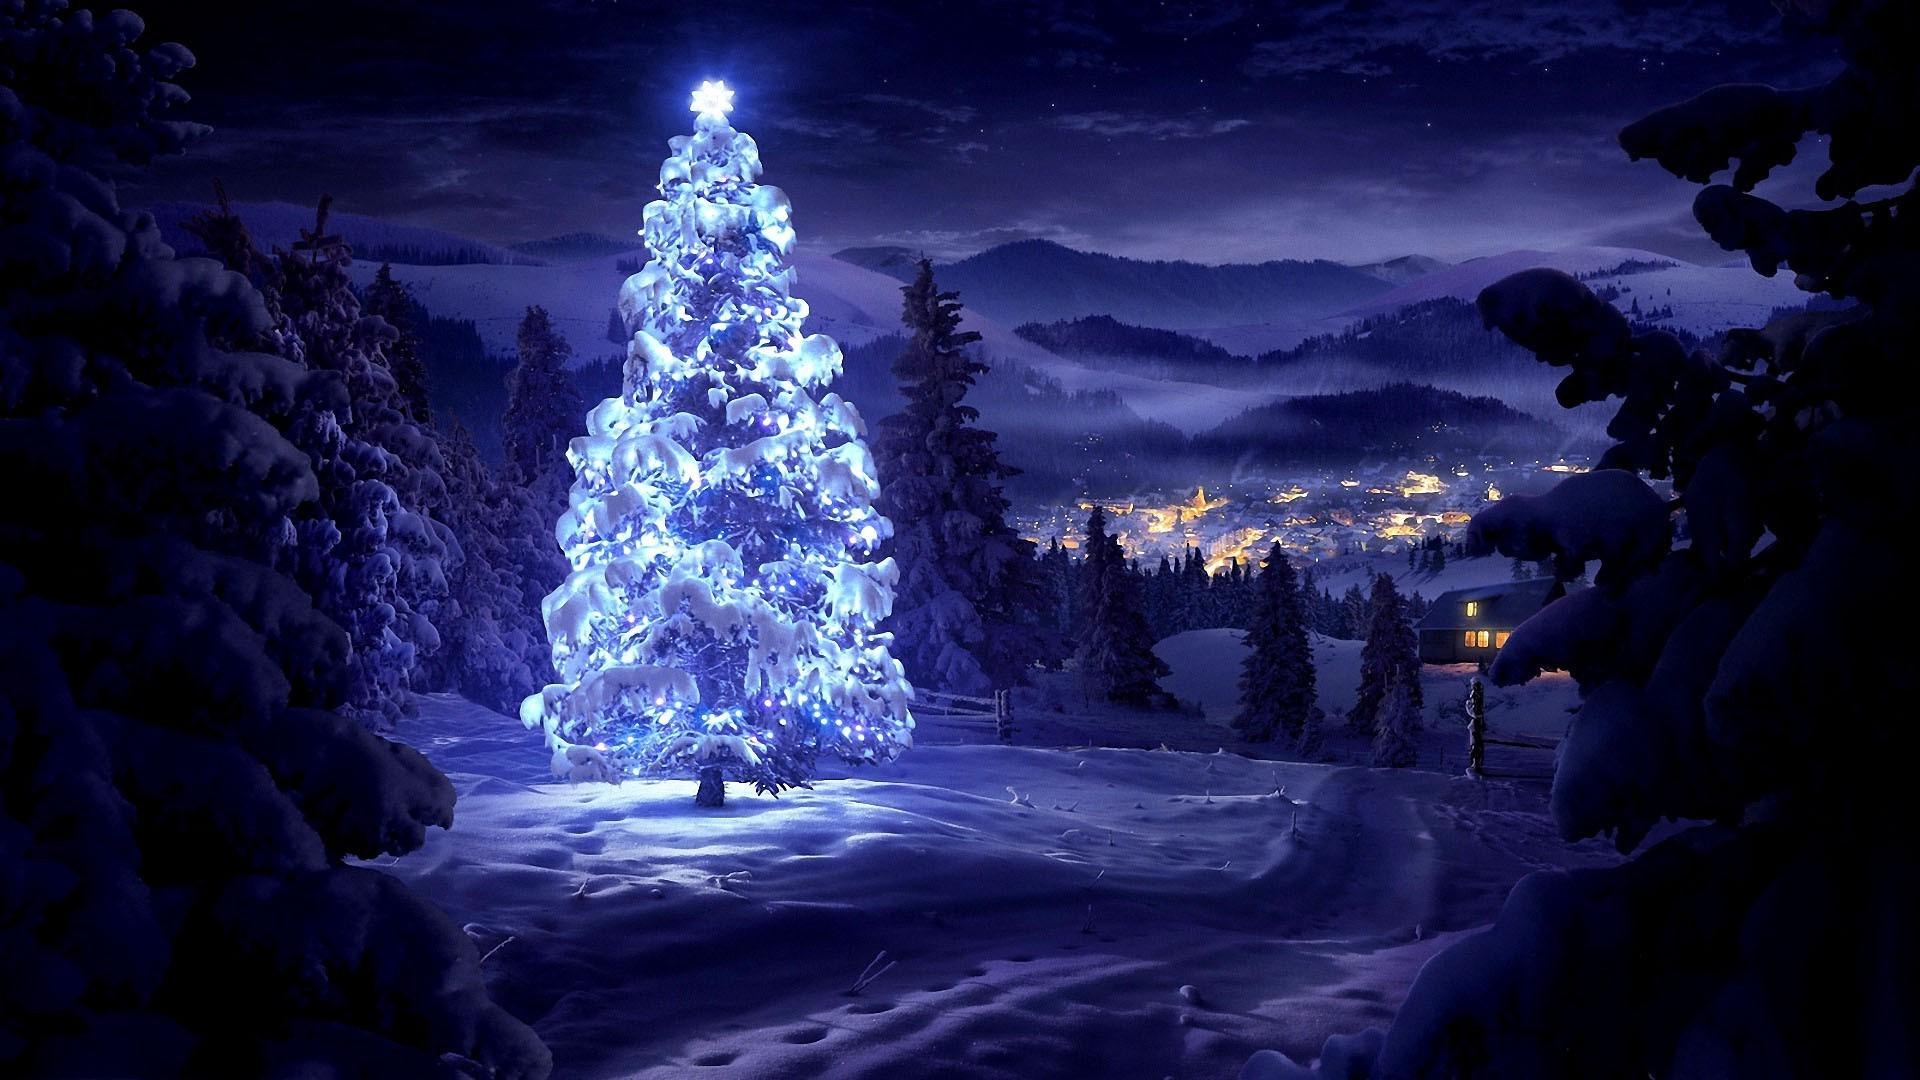 новый год дом ель ночь new year the house spruce night без смс